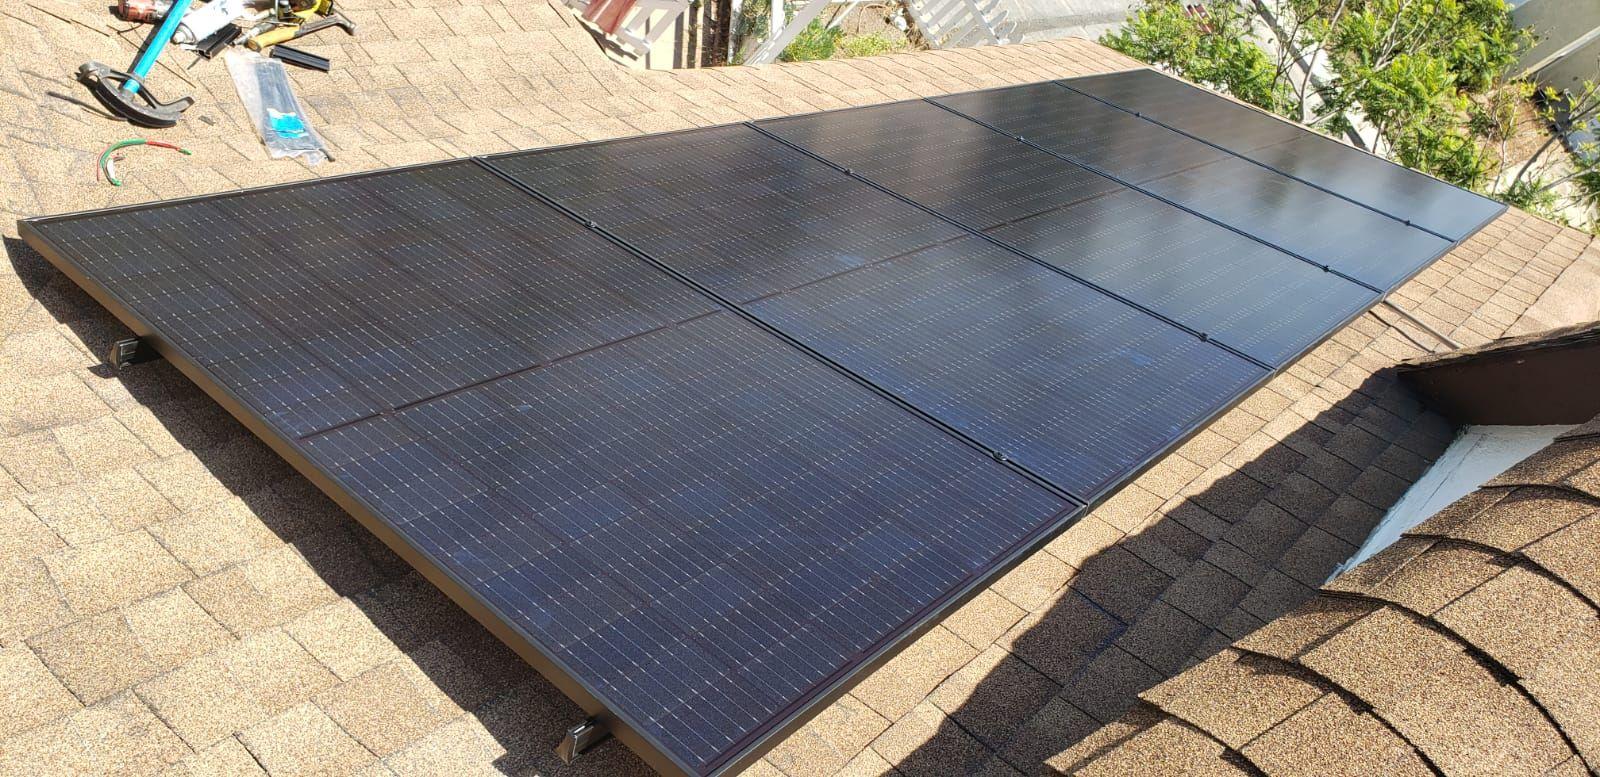 Top 6 Benefits of Solar Energy